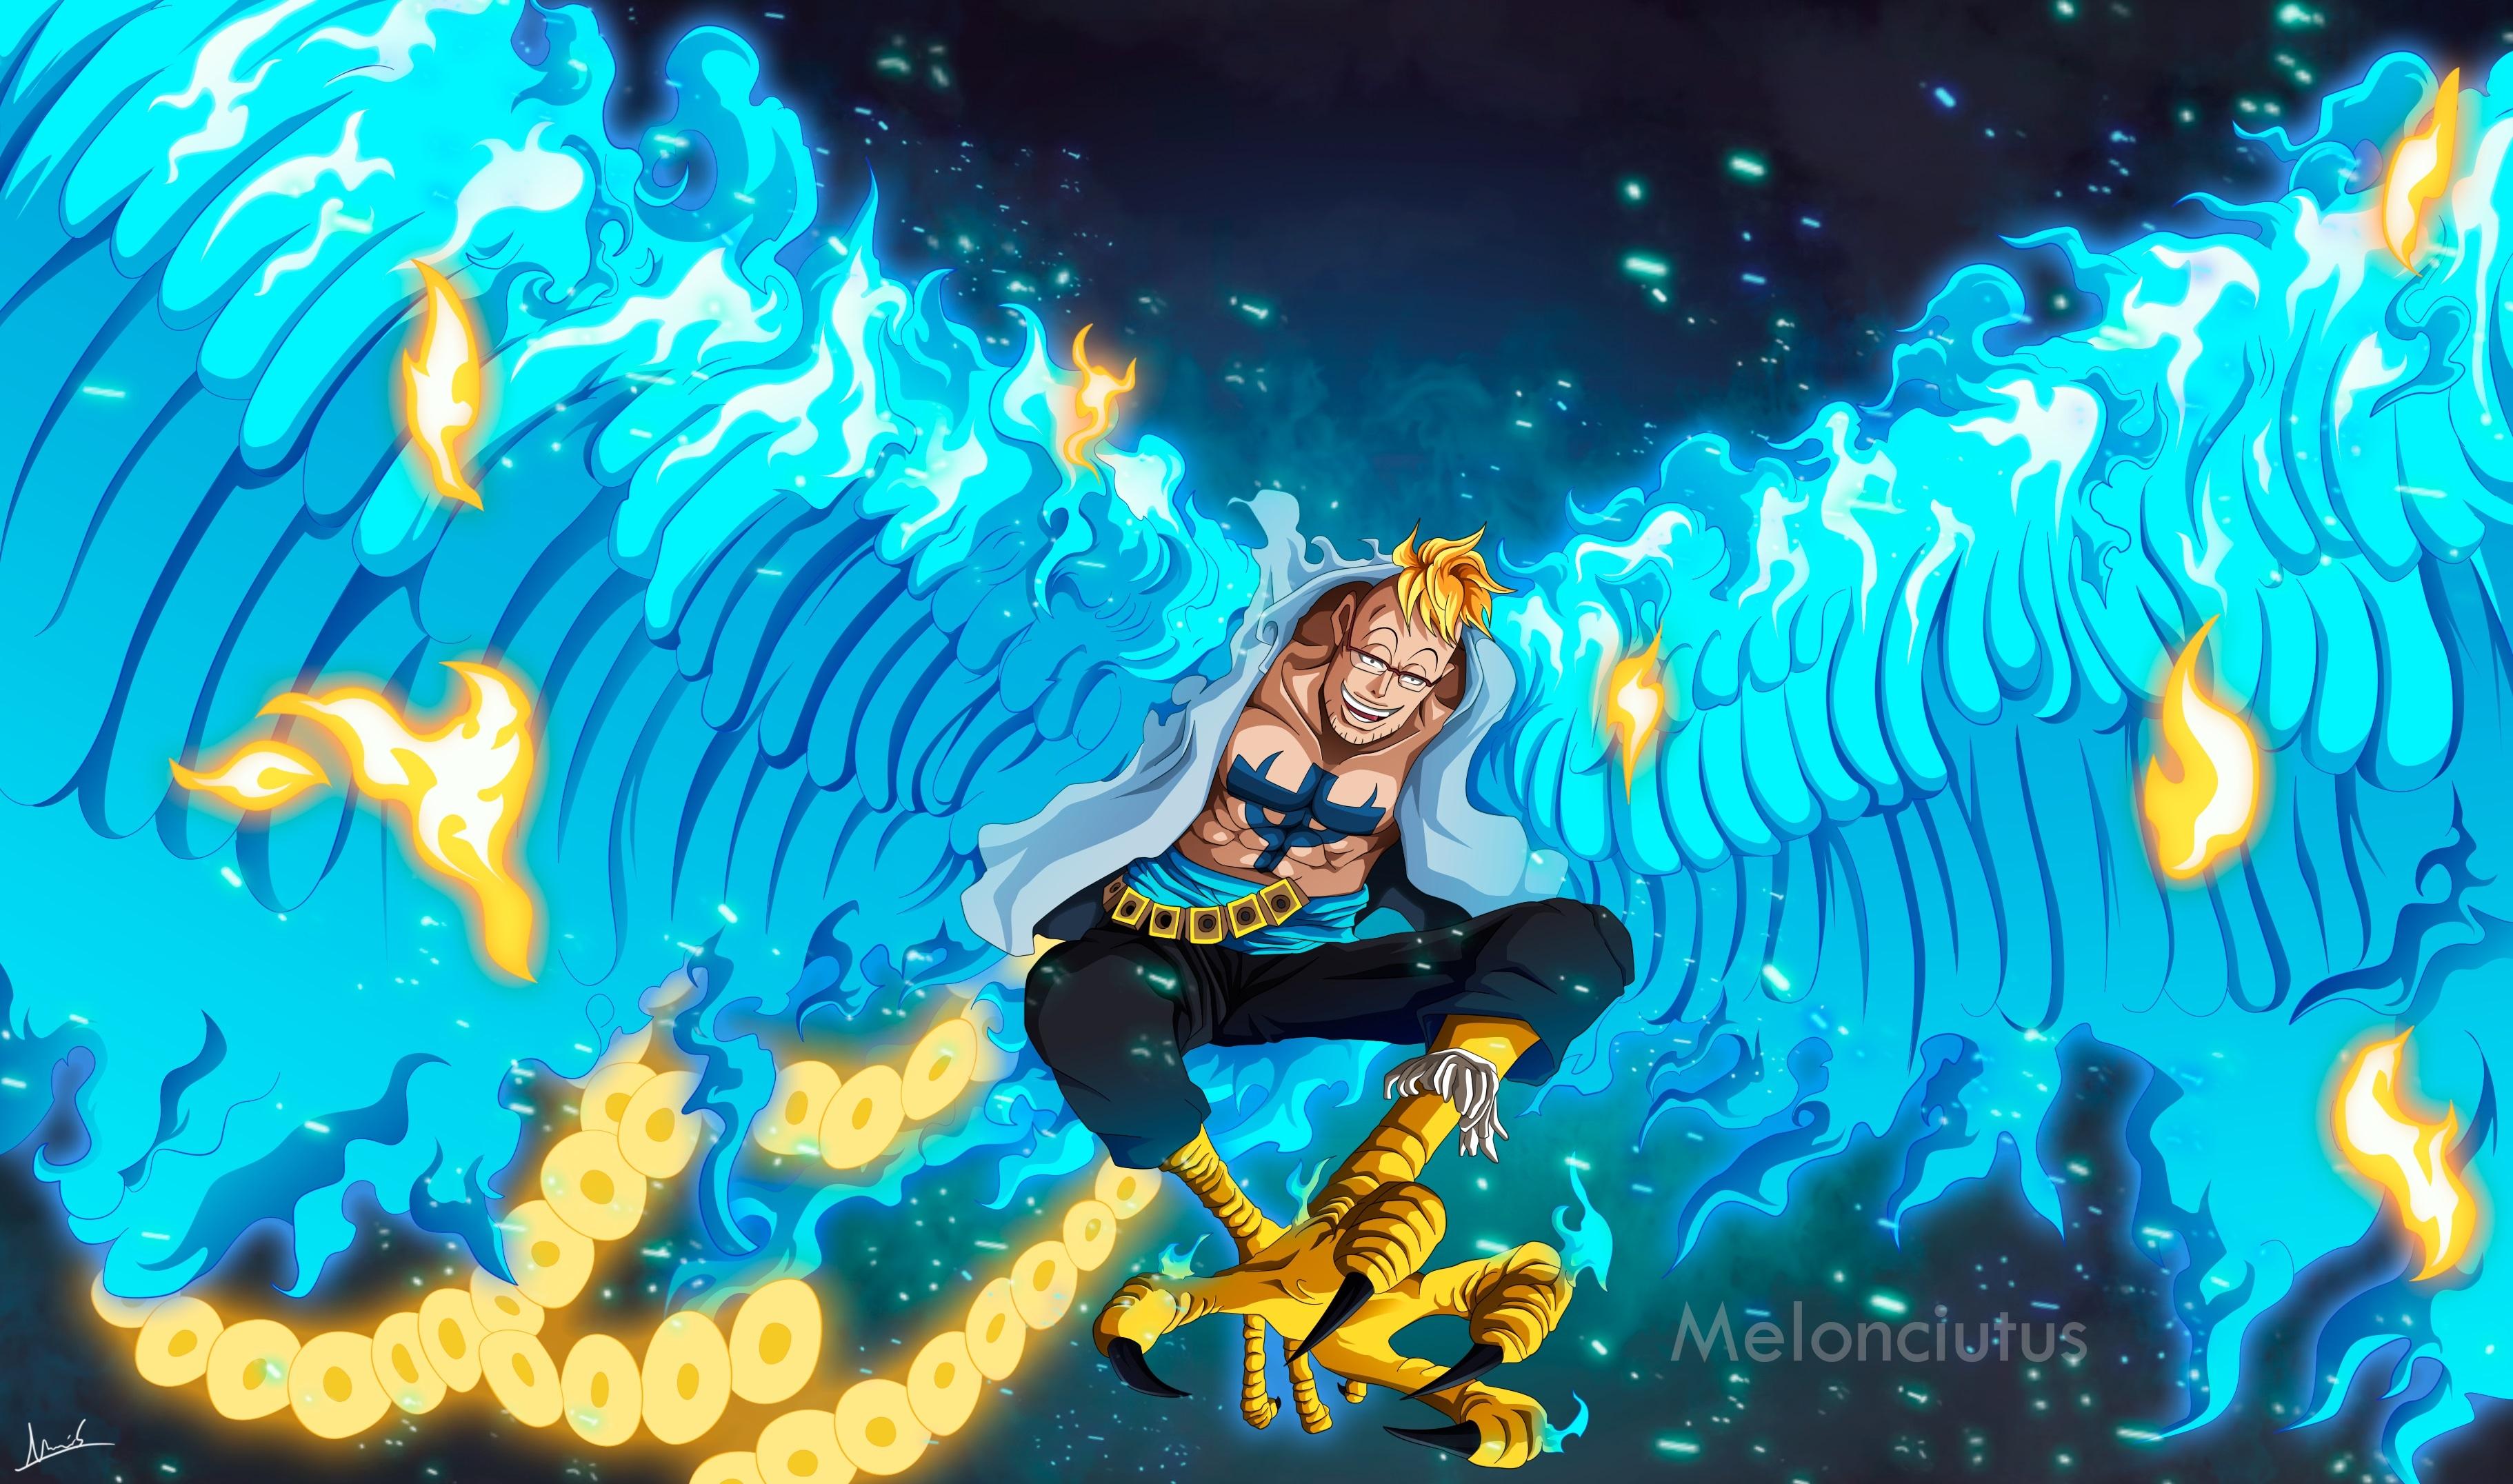 Marco One Piece Art Wallpaper, HD Anime 4K Wallpapers ...